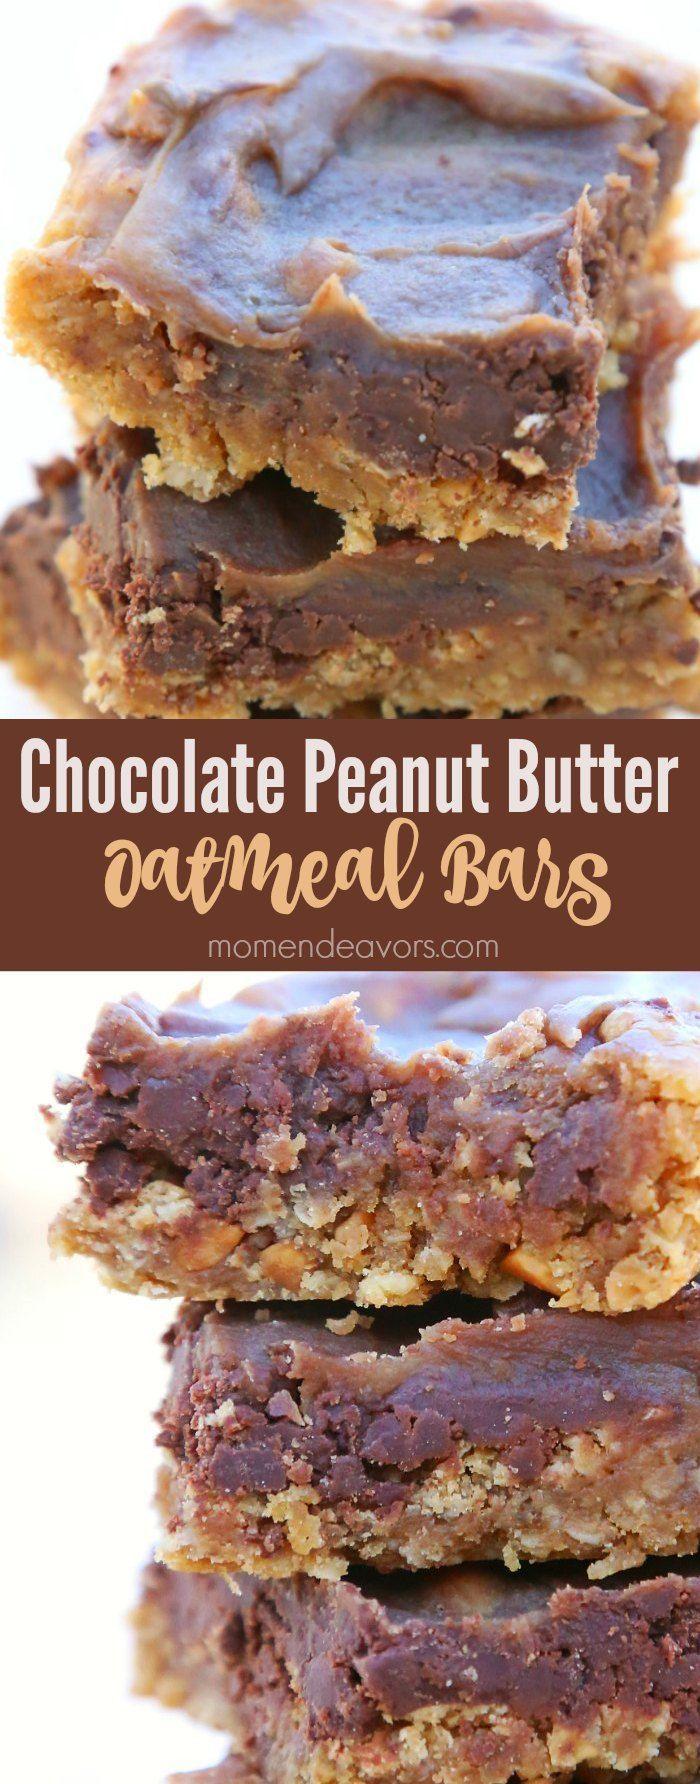 Chocolate Peanut Butter Oatmeal Bars - SO good!!